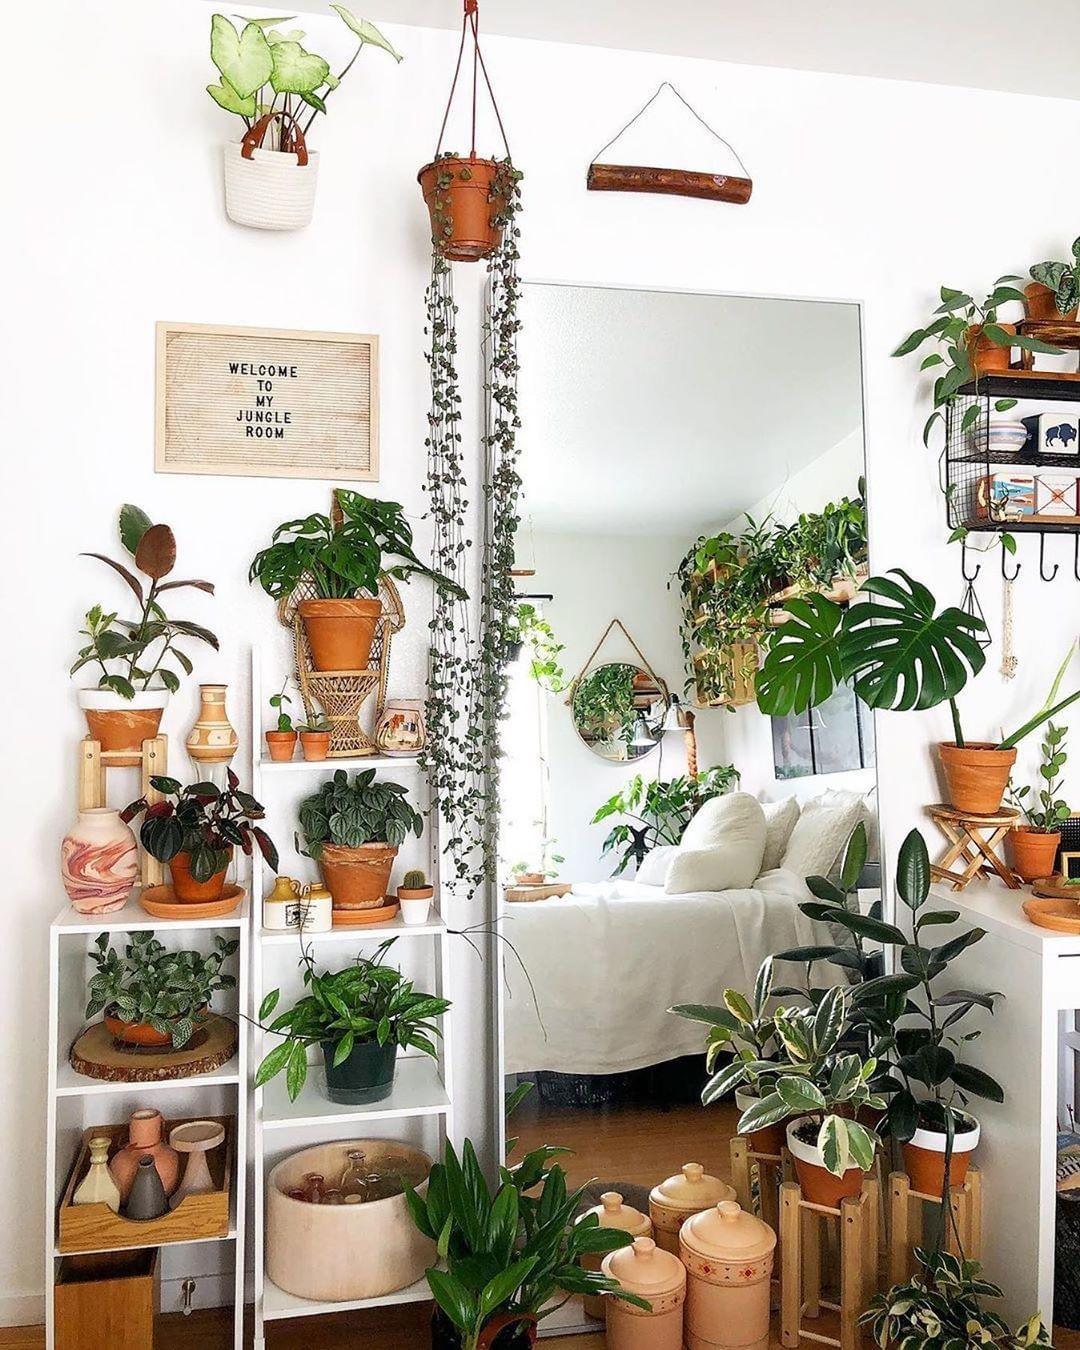 40+ Beautiful Plants Ideas For Home Decor